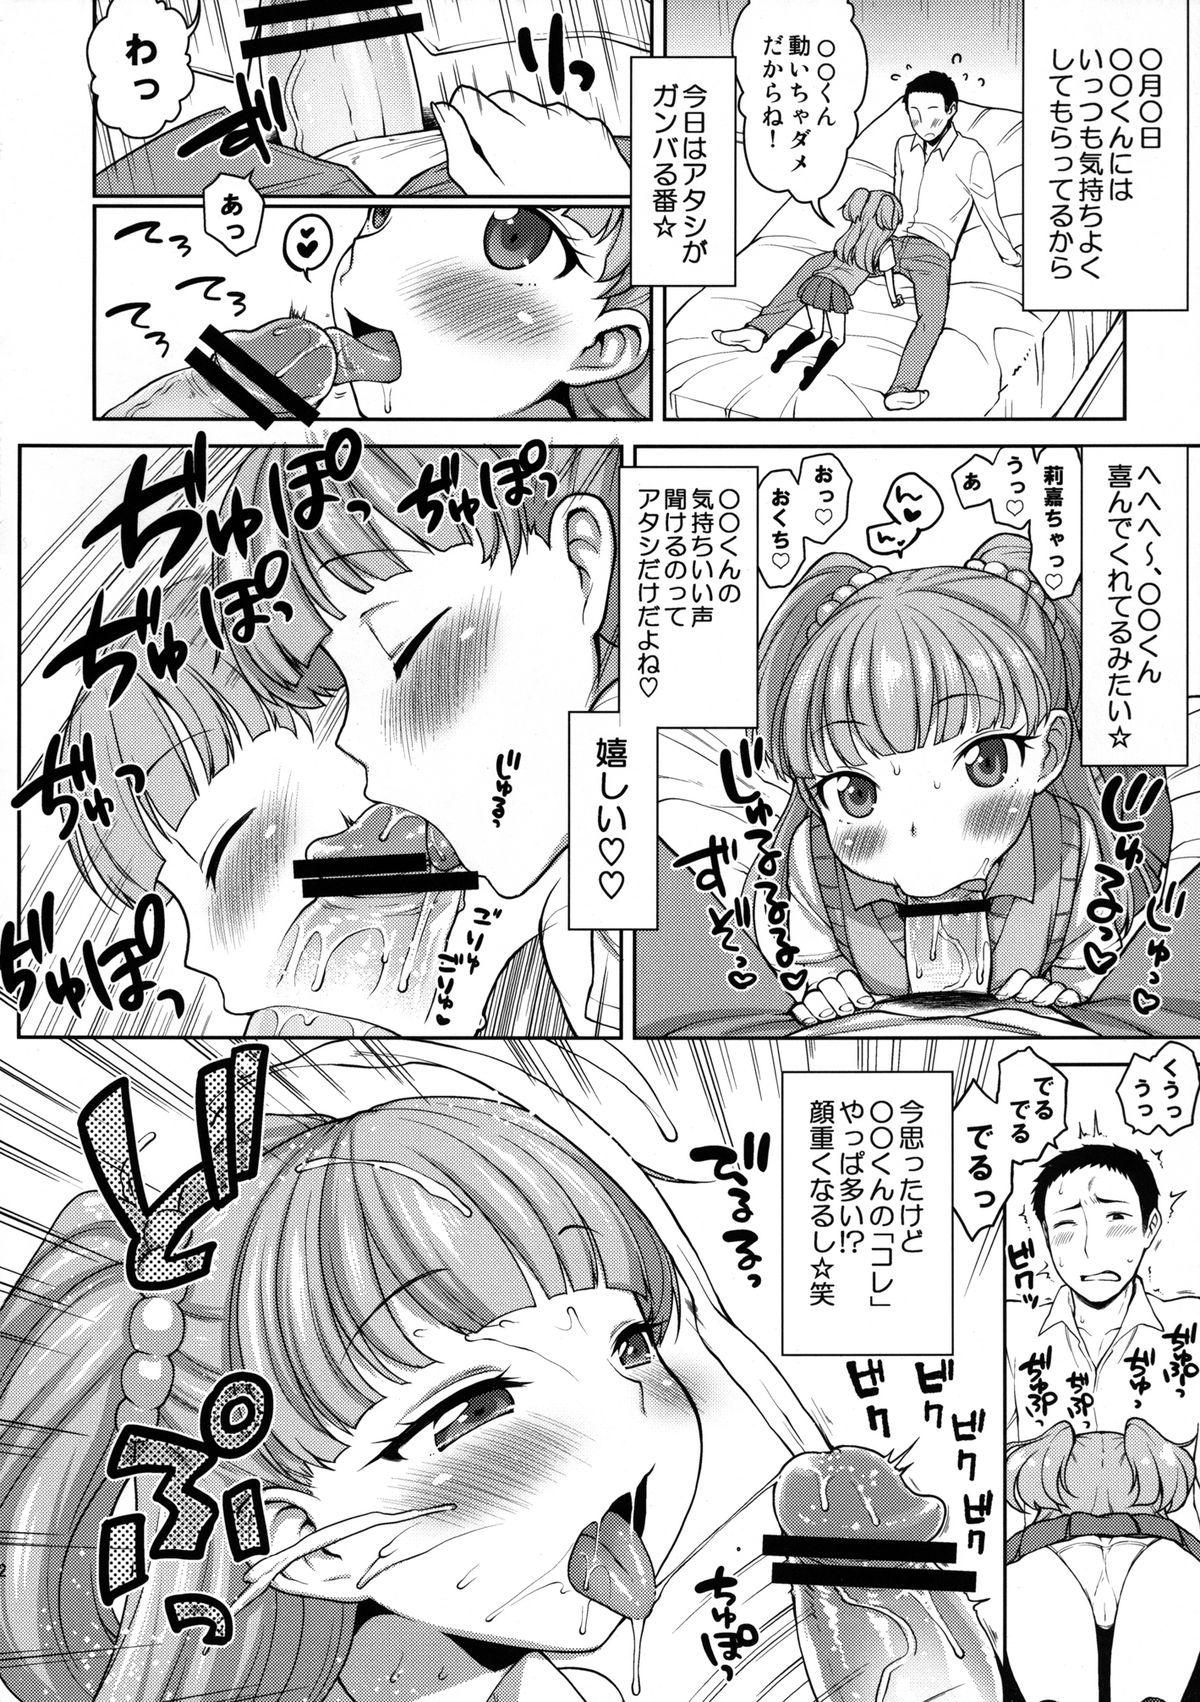 Rika-chan Kawaii 10